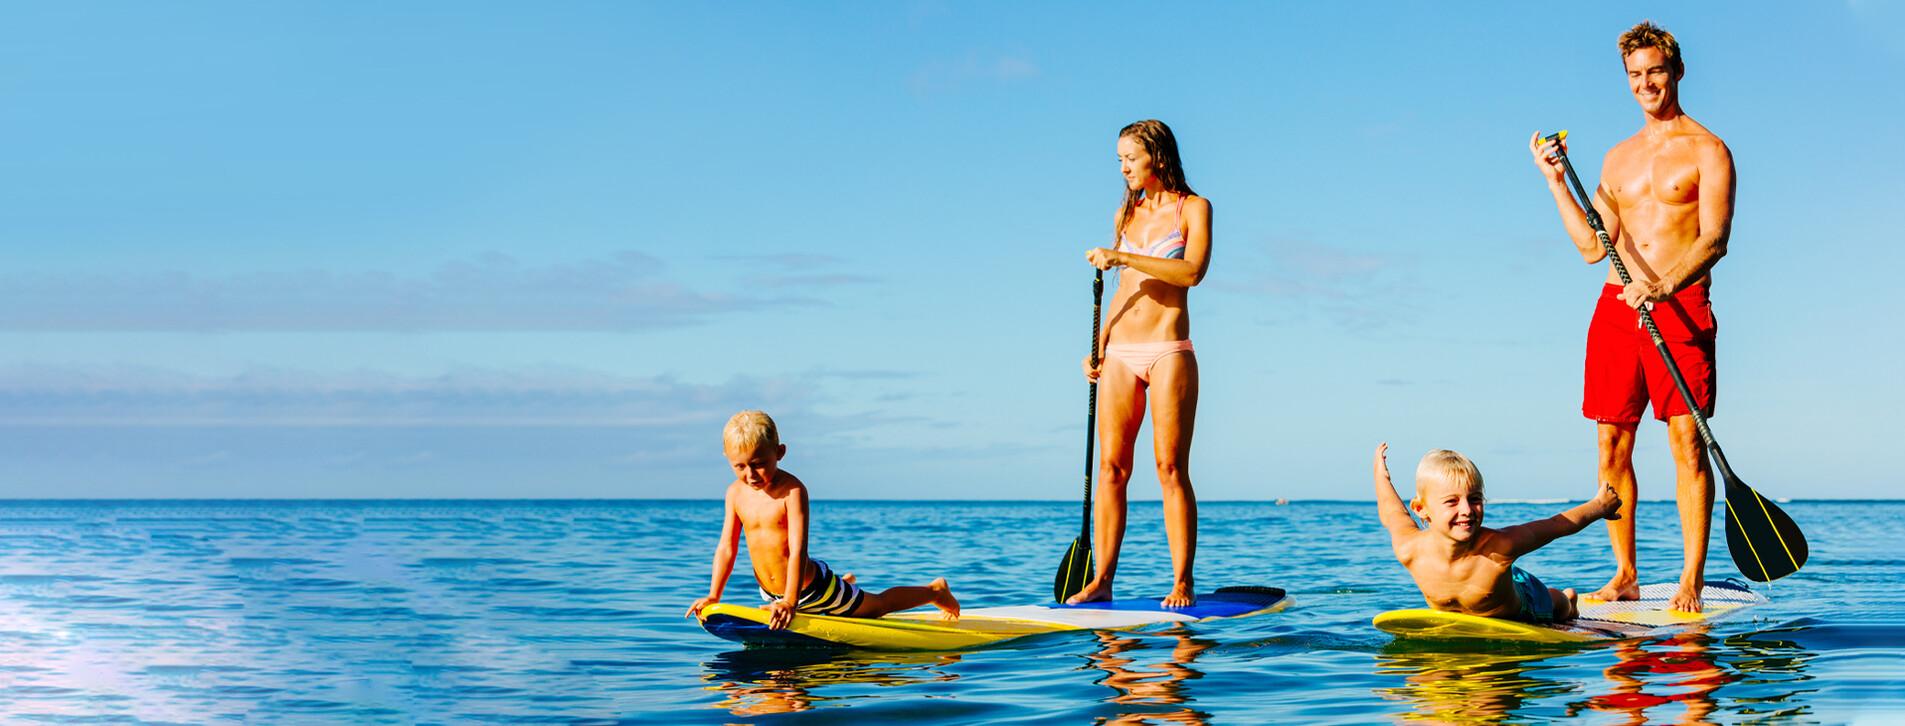 Fotoğraf 1 - Aile için Stand Up Paddle Kiralama